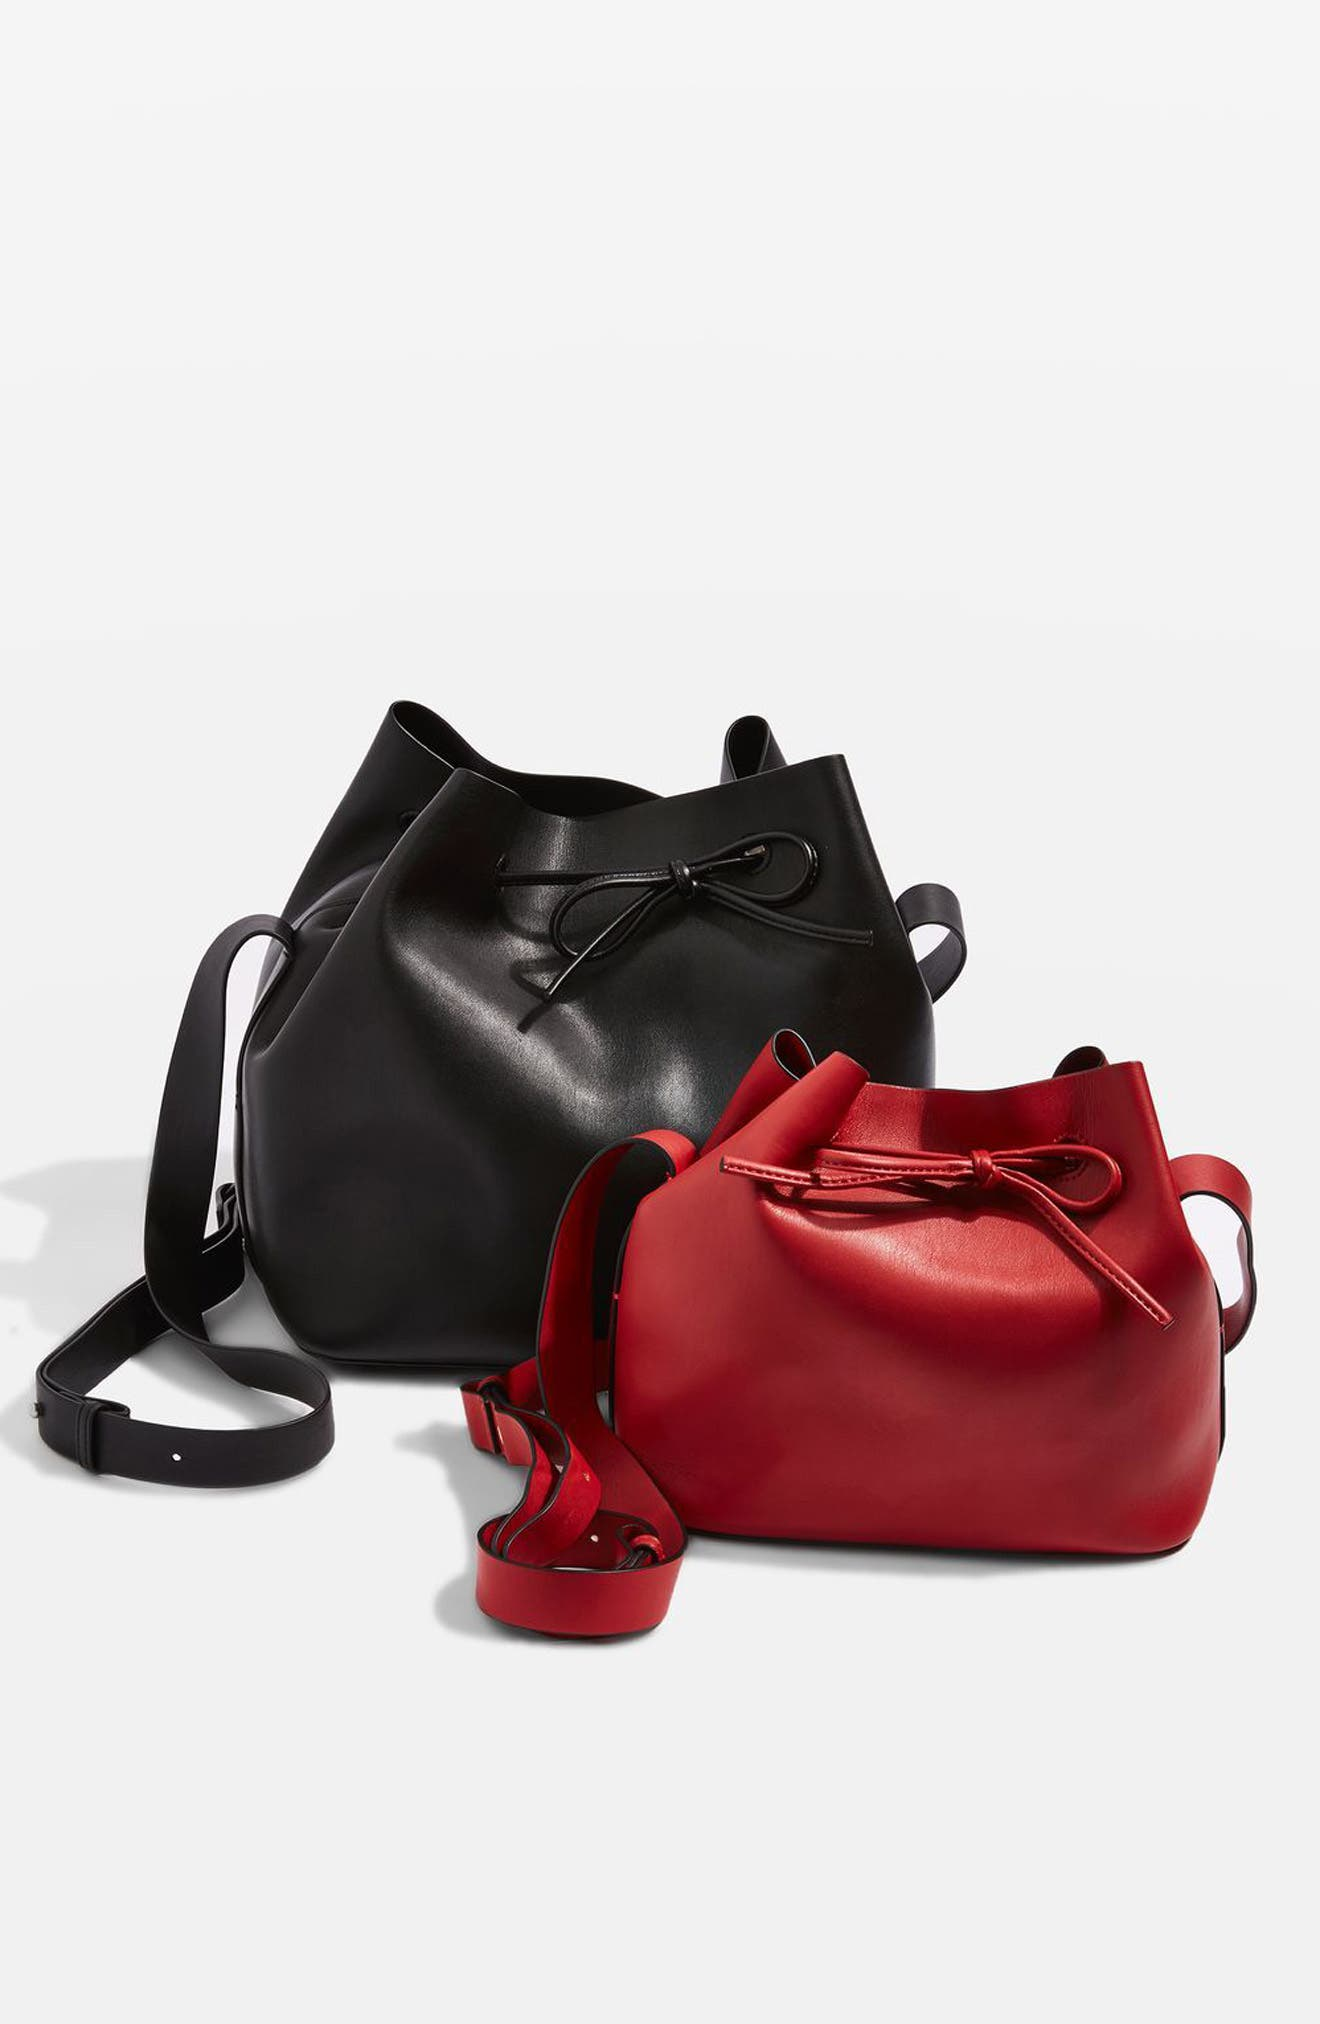 Stella Faux Leather Bucket Bag,                             Alternate thumbnail 9, color,                             001